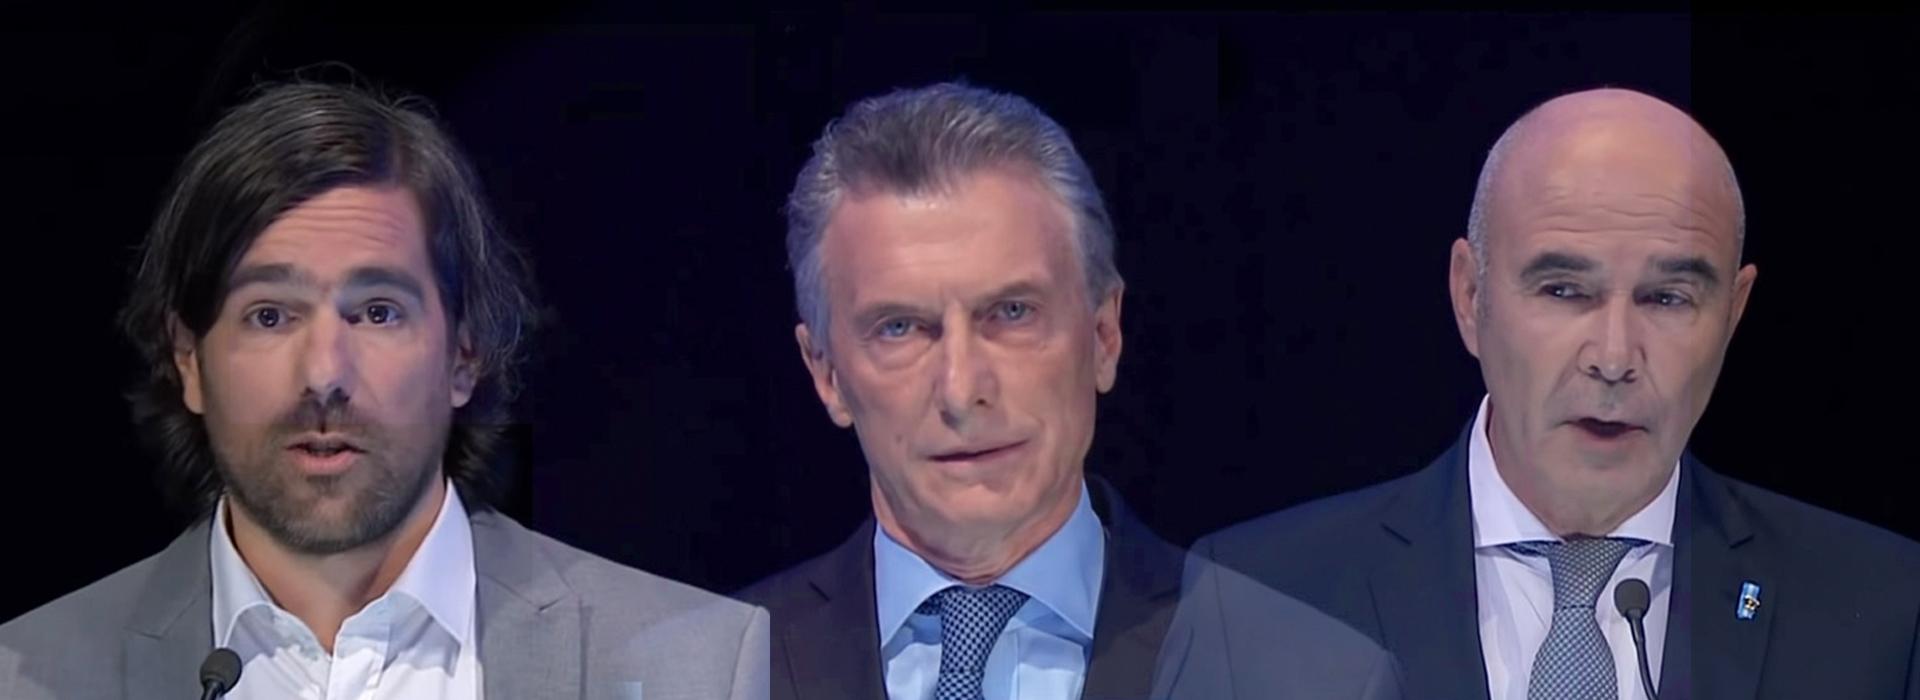 debate_2019_08 (1)